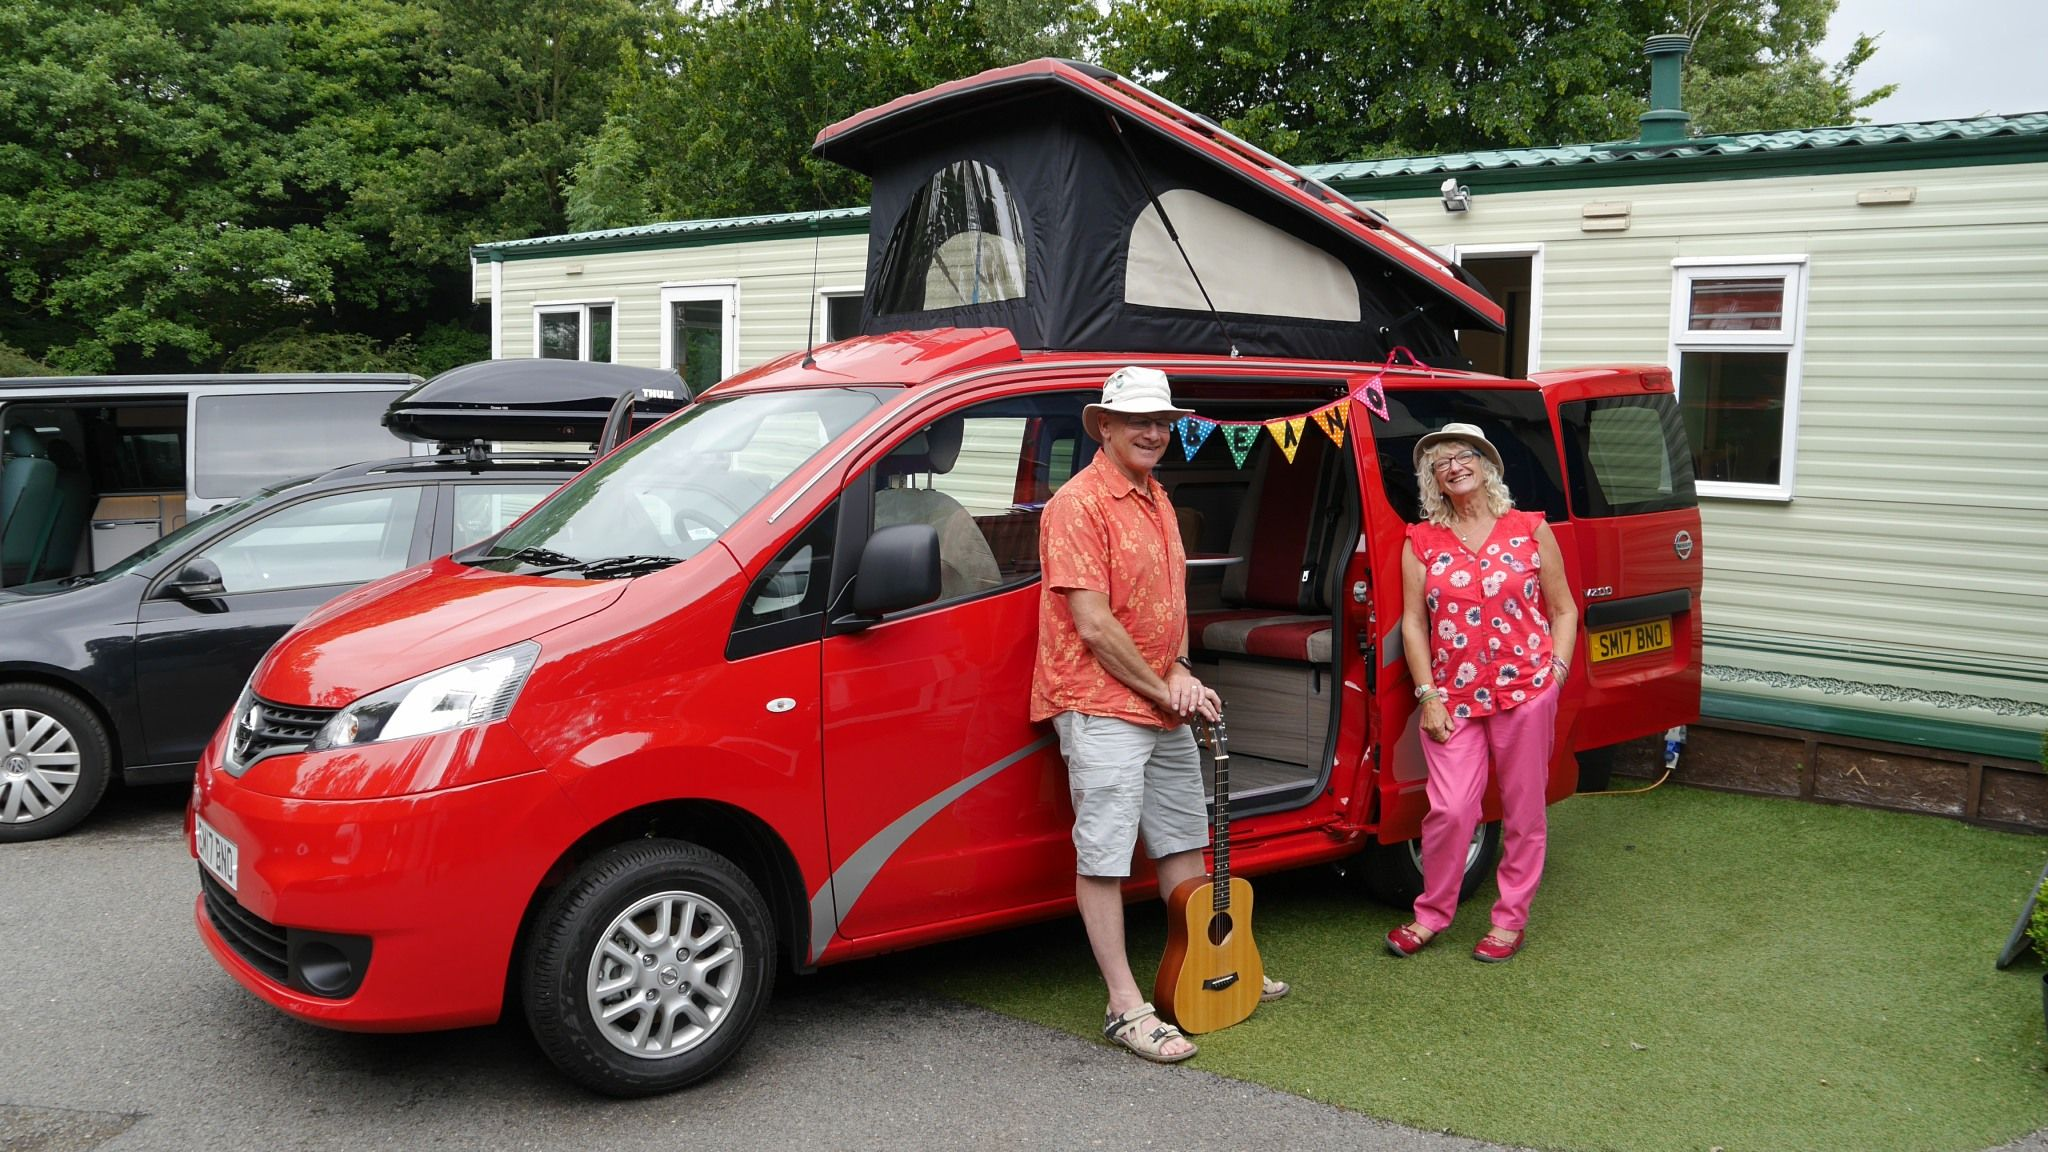 The Nissan Nv200 Campercar By Sussex Campervans Comes In A Petrol Auto Or A Diesel Manual Version Campervan Nissan Camper